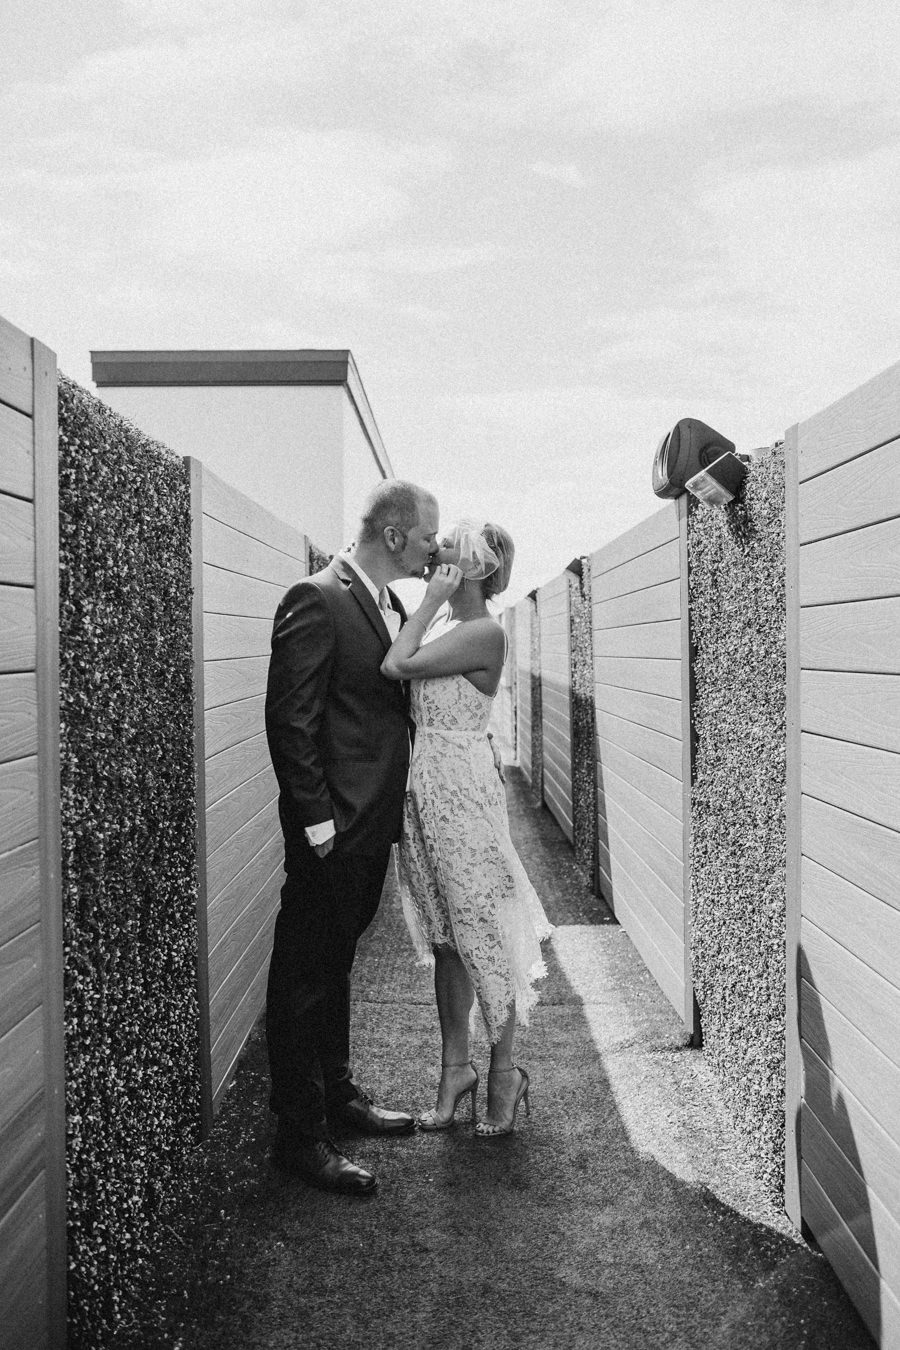 St Pete Elopement Wedding Photography Hotel Zamora-8.jpg